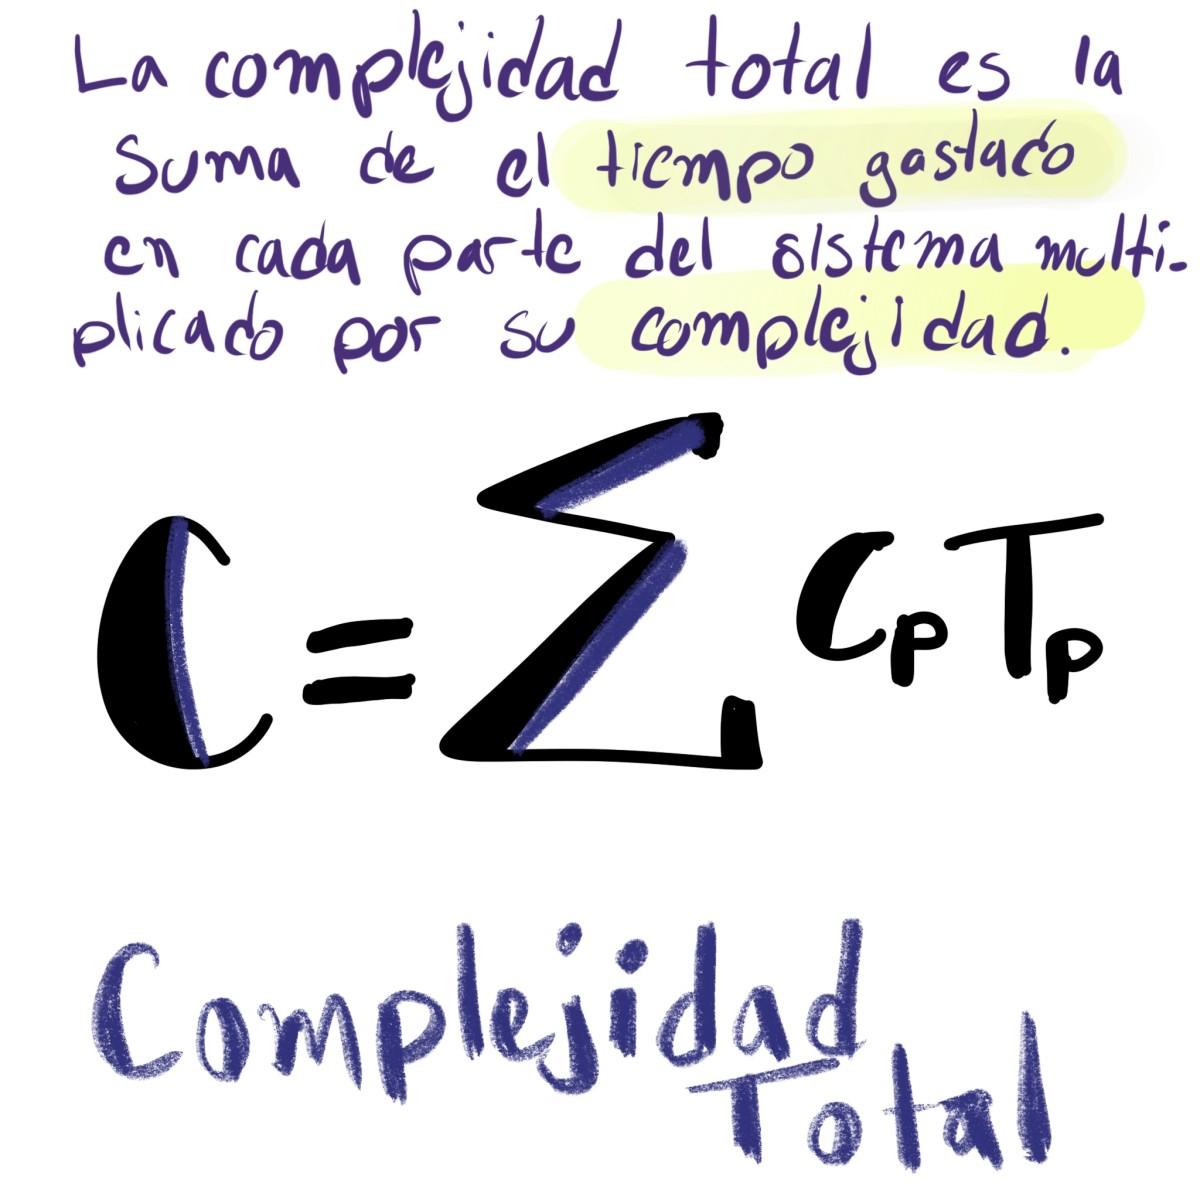 Fórmula para calcular la complejidad